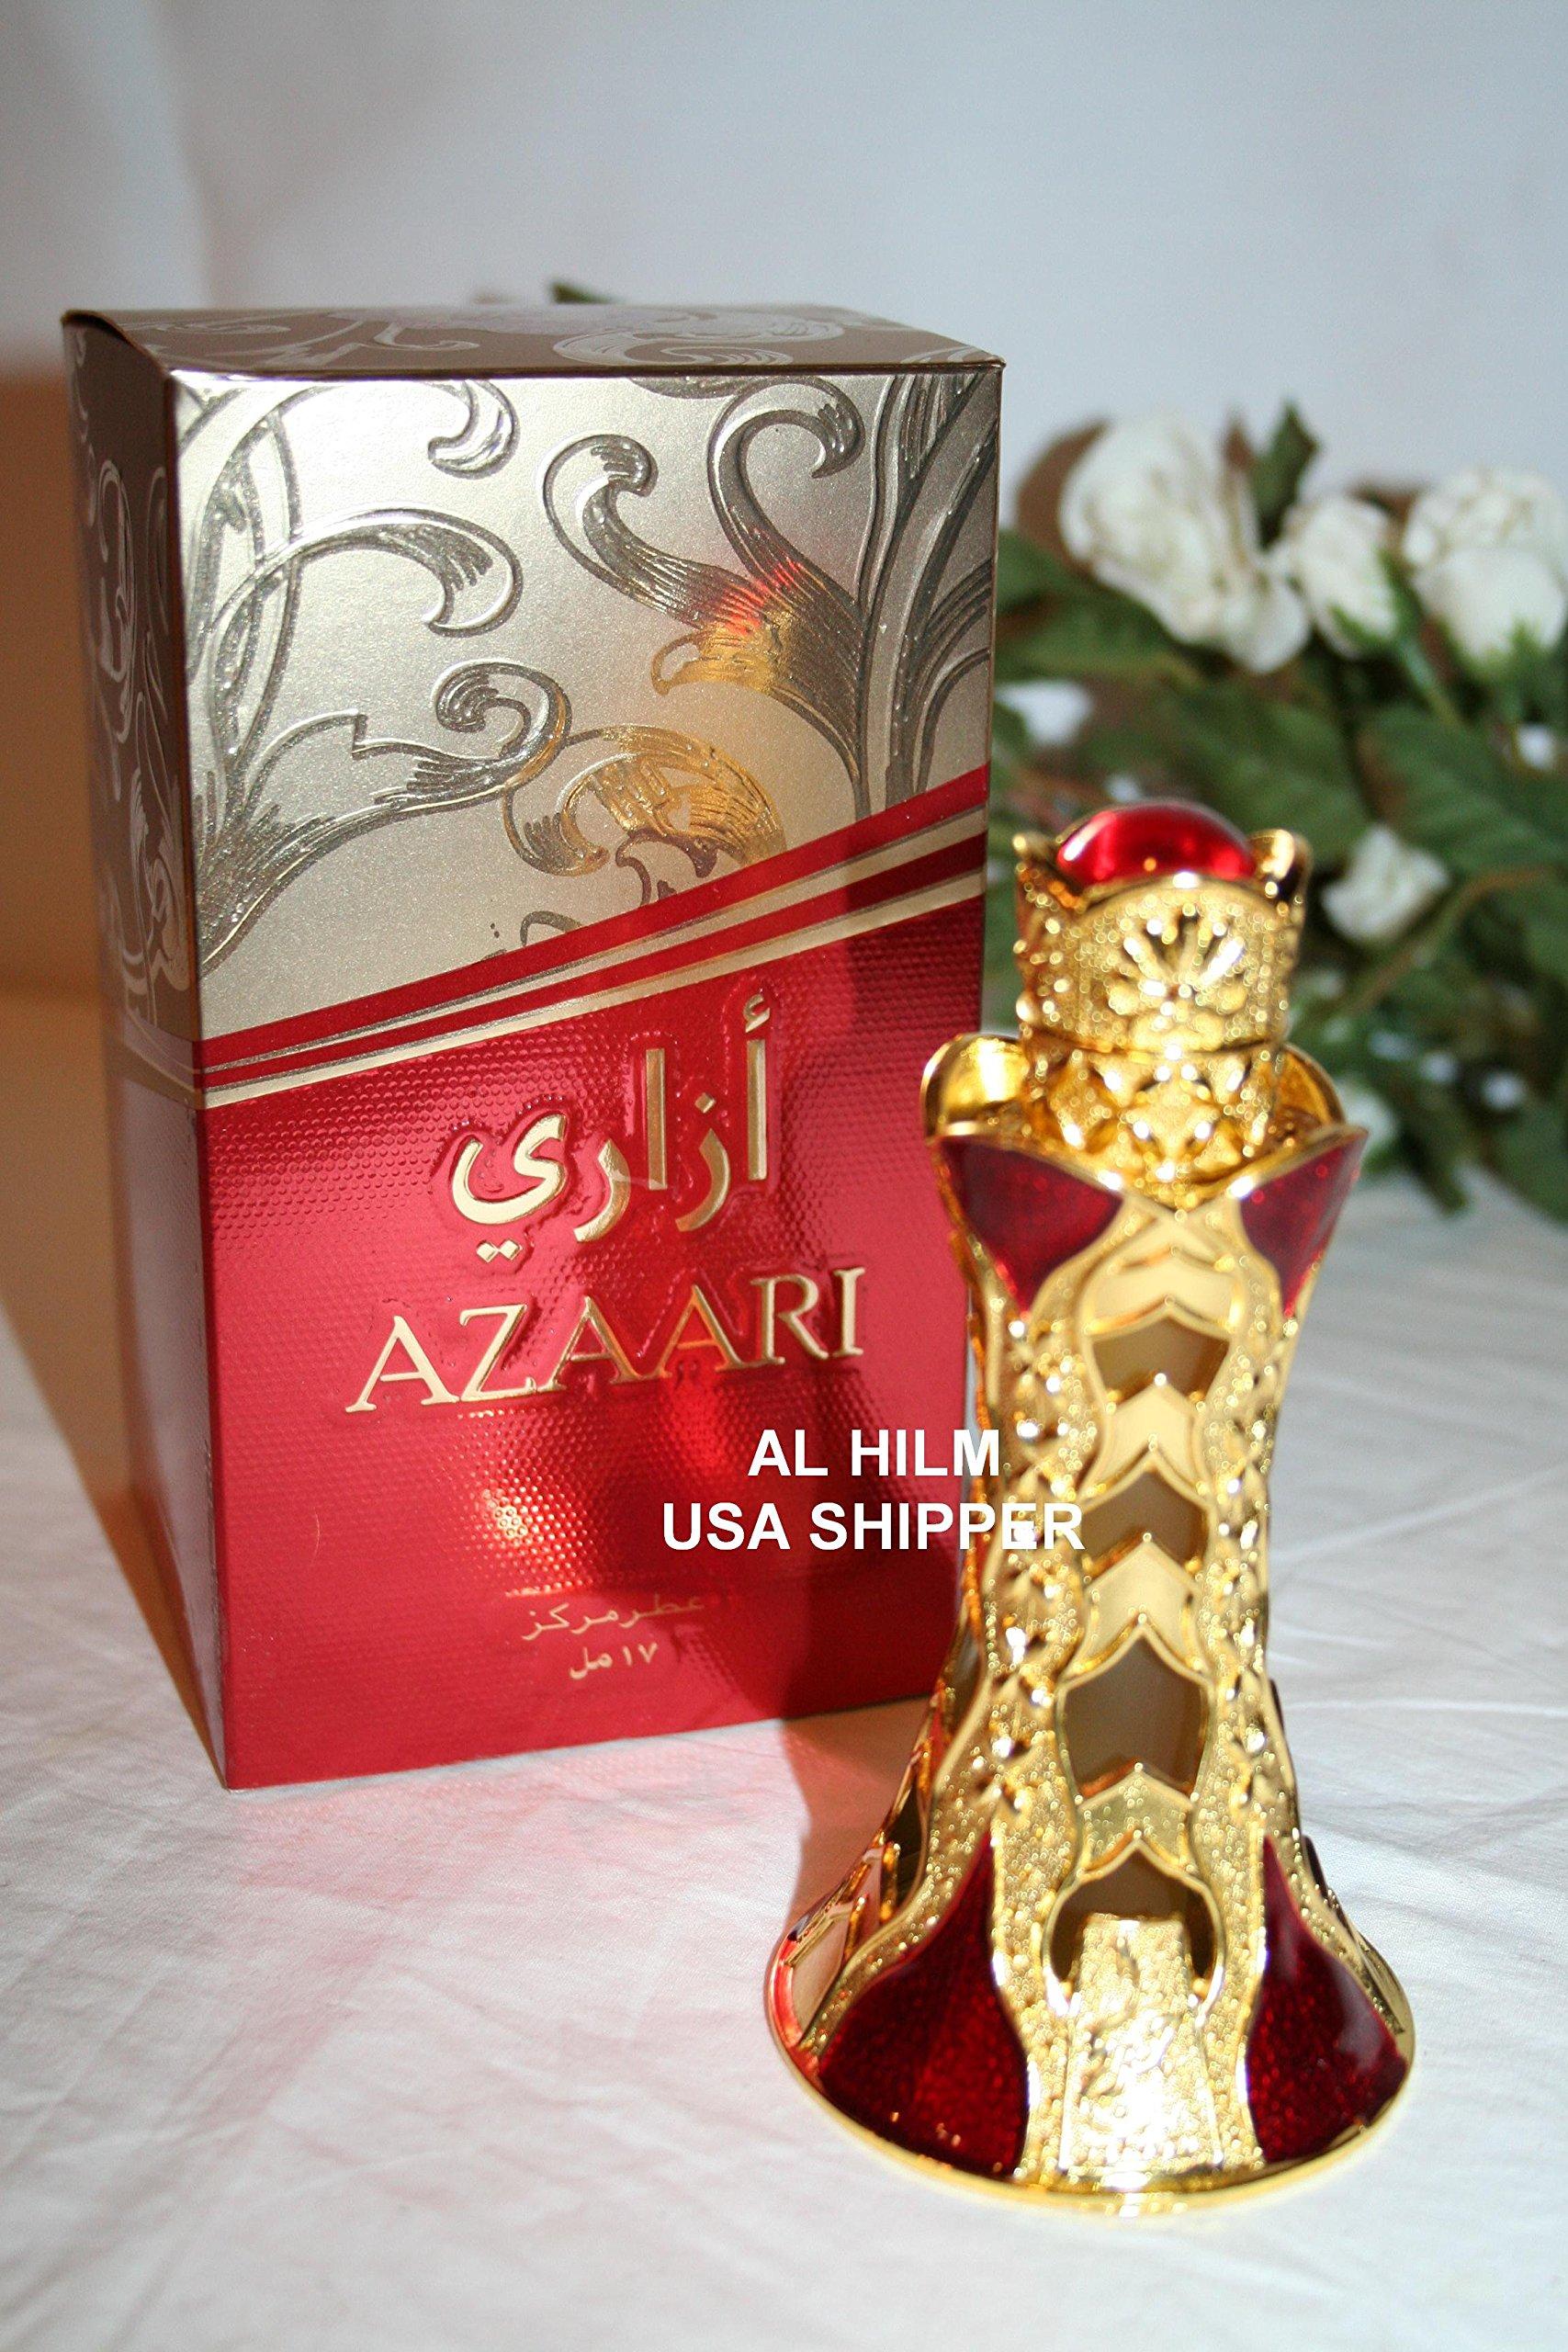 Azaari - Alcohol Free Arabic Perfume Oil Fragrance for Men and Women (Unisex)